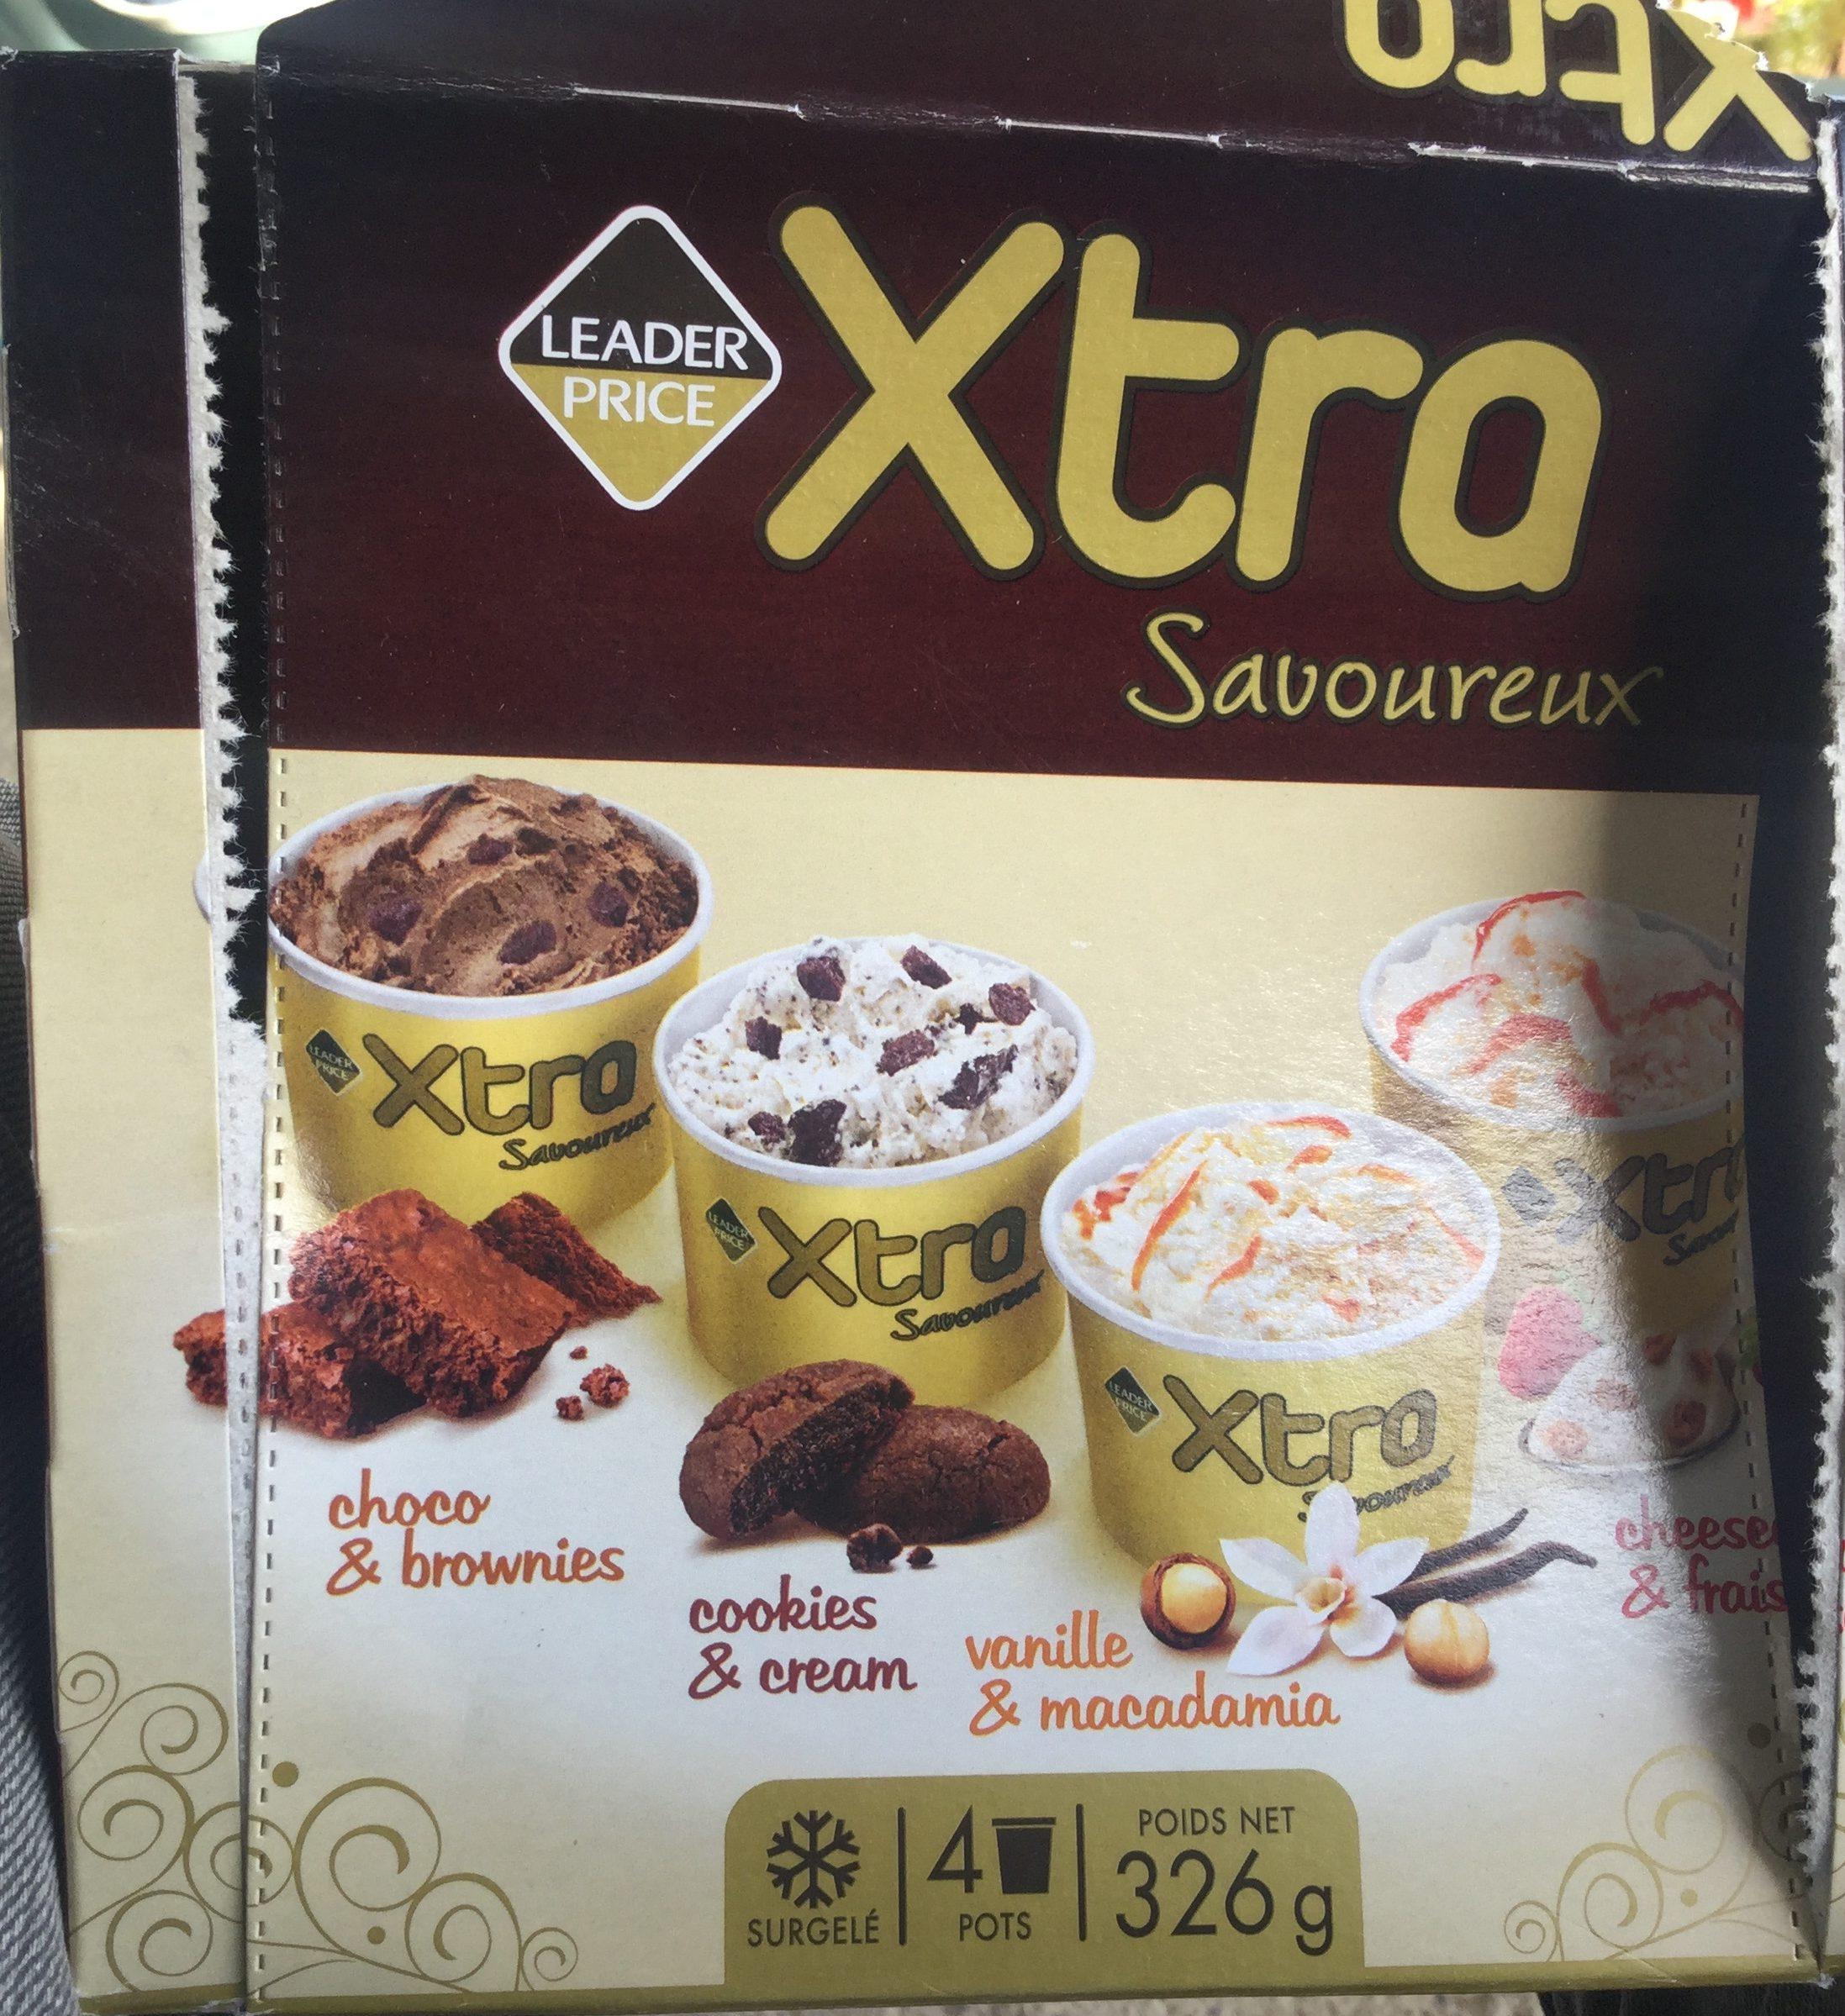 Xtra savoureux - Produkt